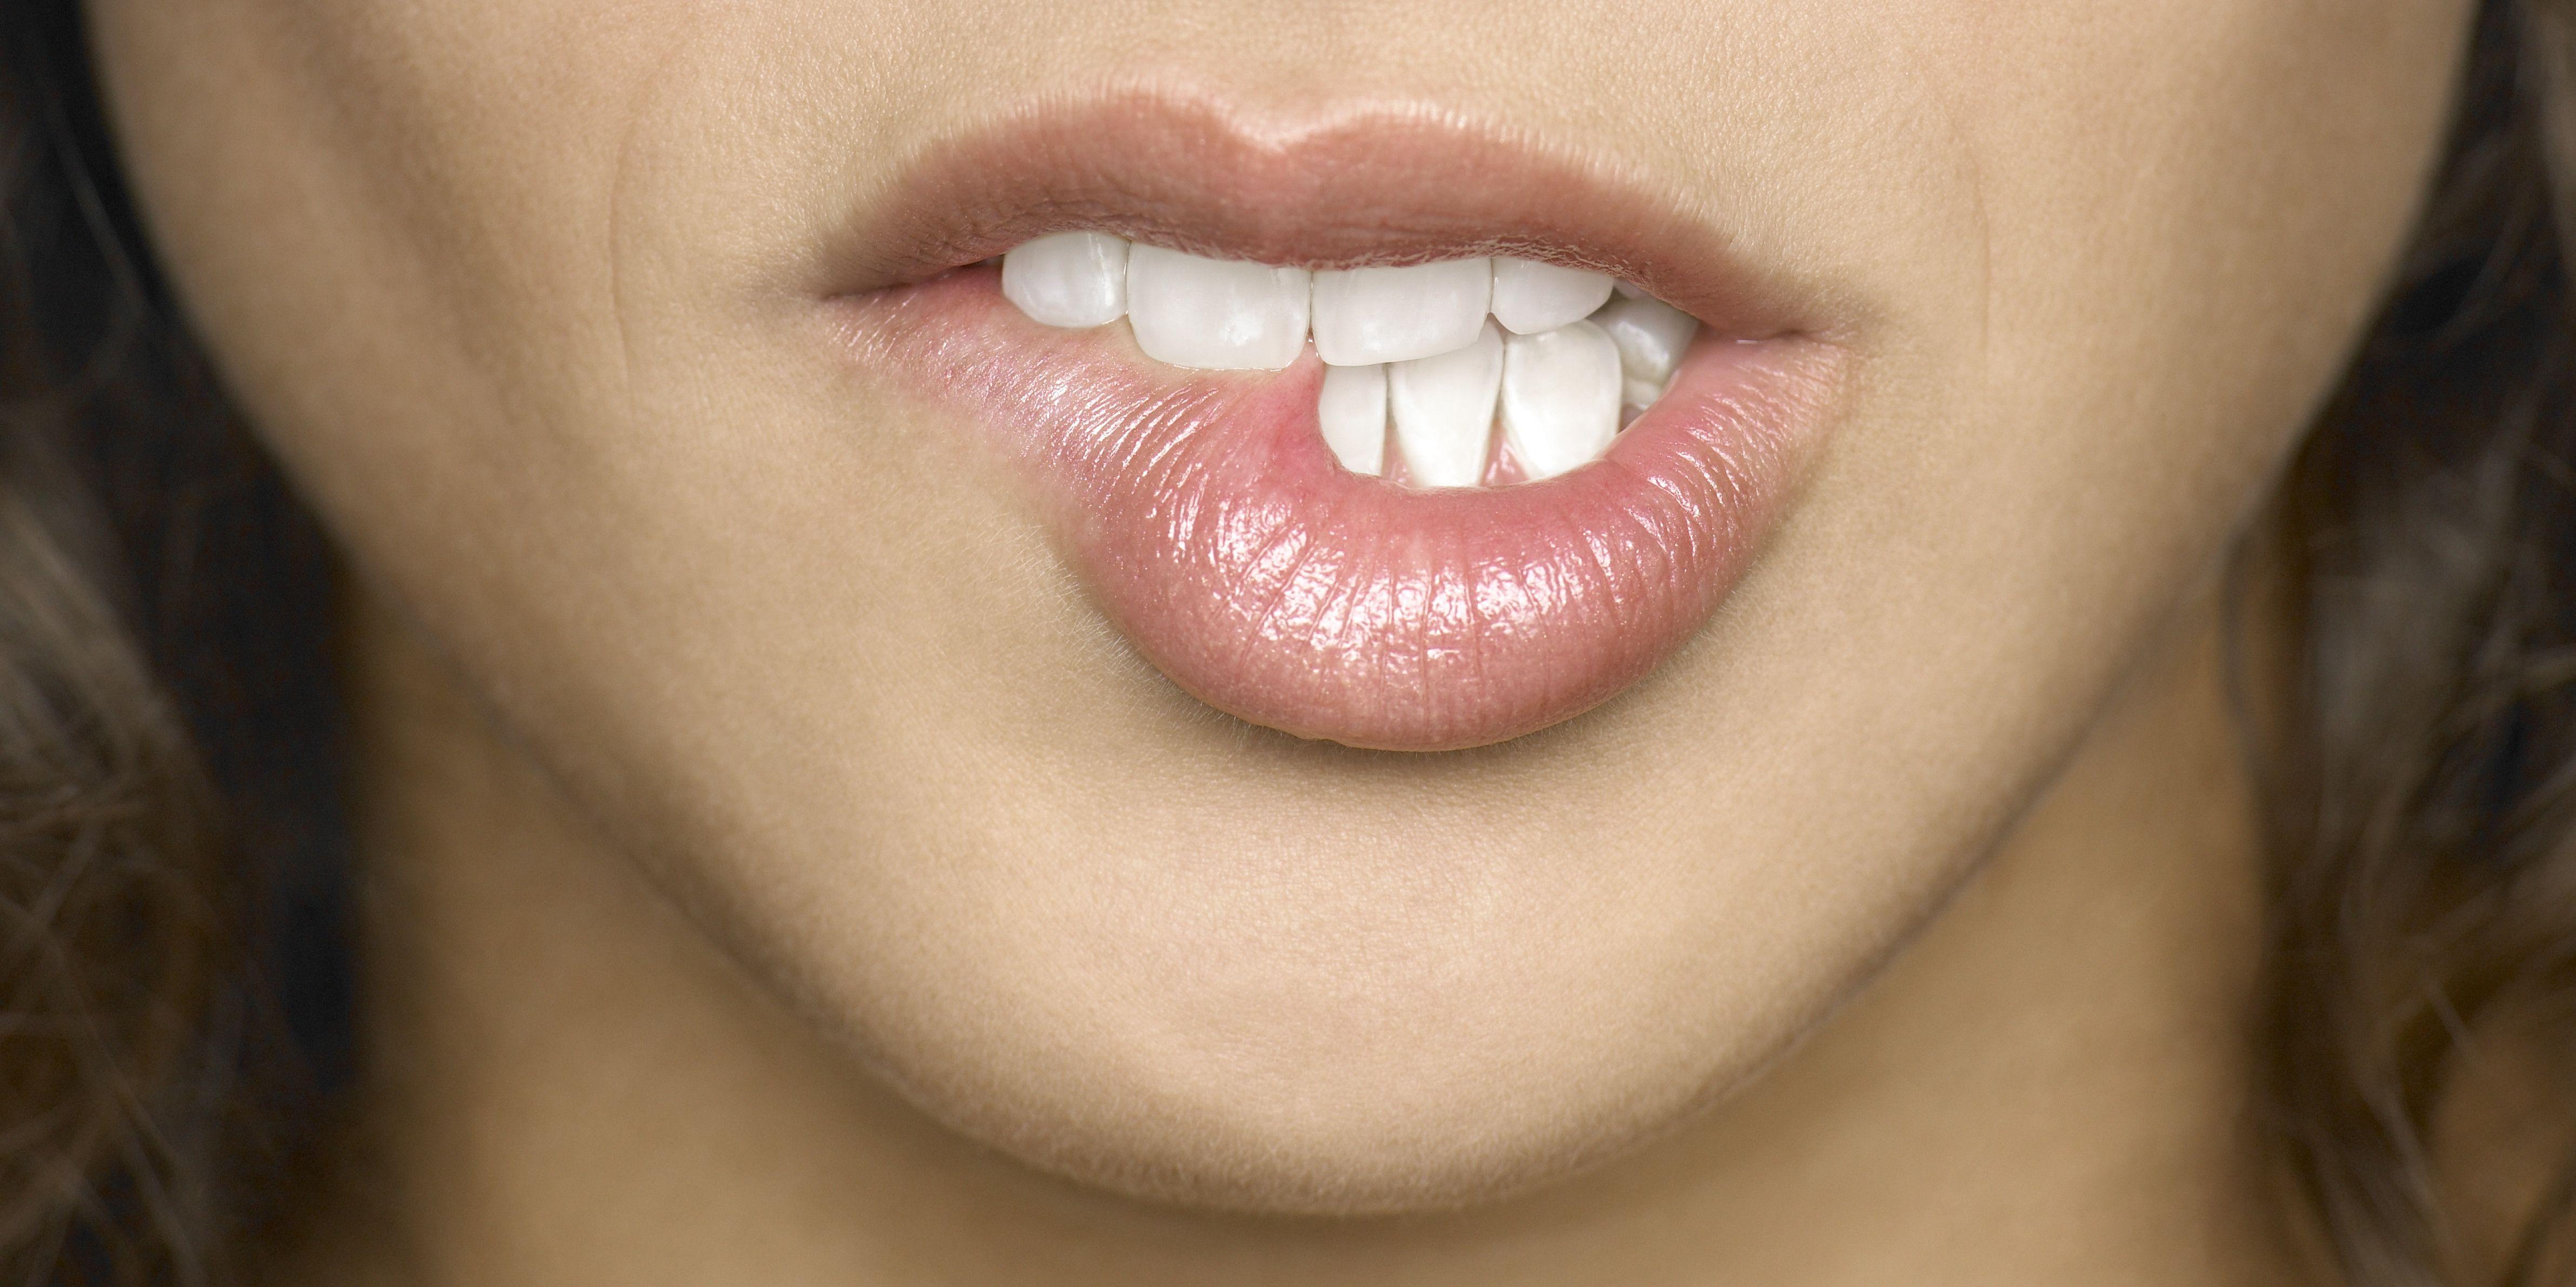 Https Life Entertainment A22822190 Jill Beauty Lip Matte 01 Red Cherry 1474494051 Gettyimages 200251838 001